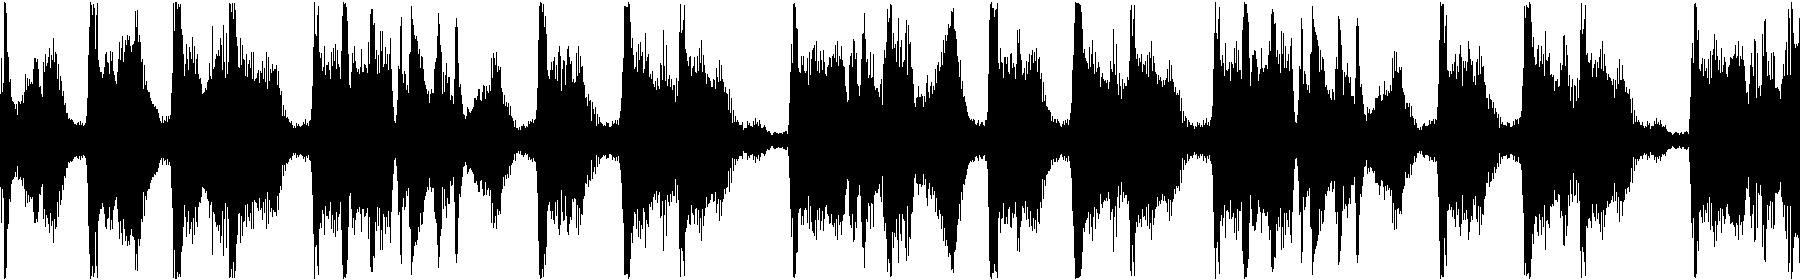 03   synth loop 125bpm am